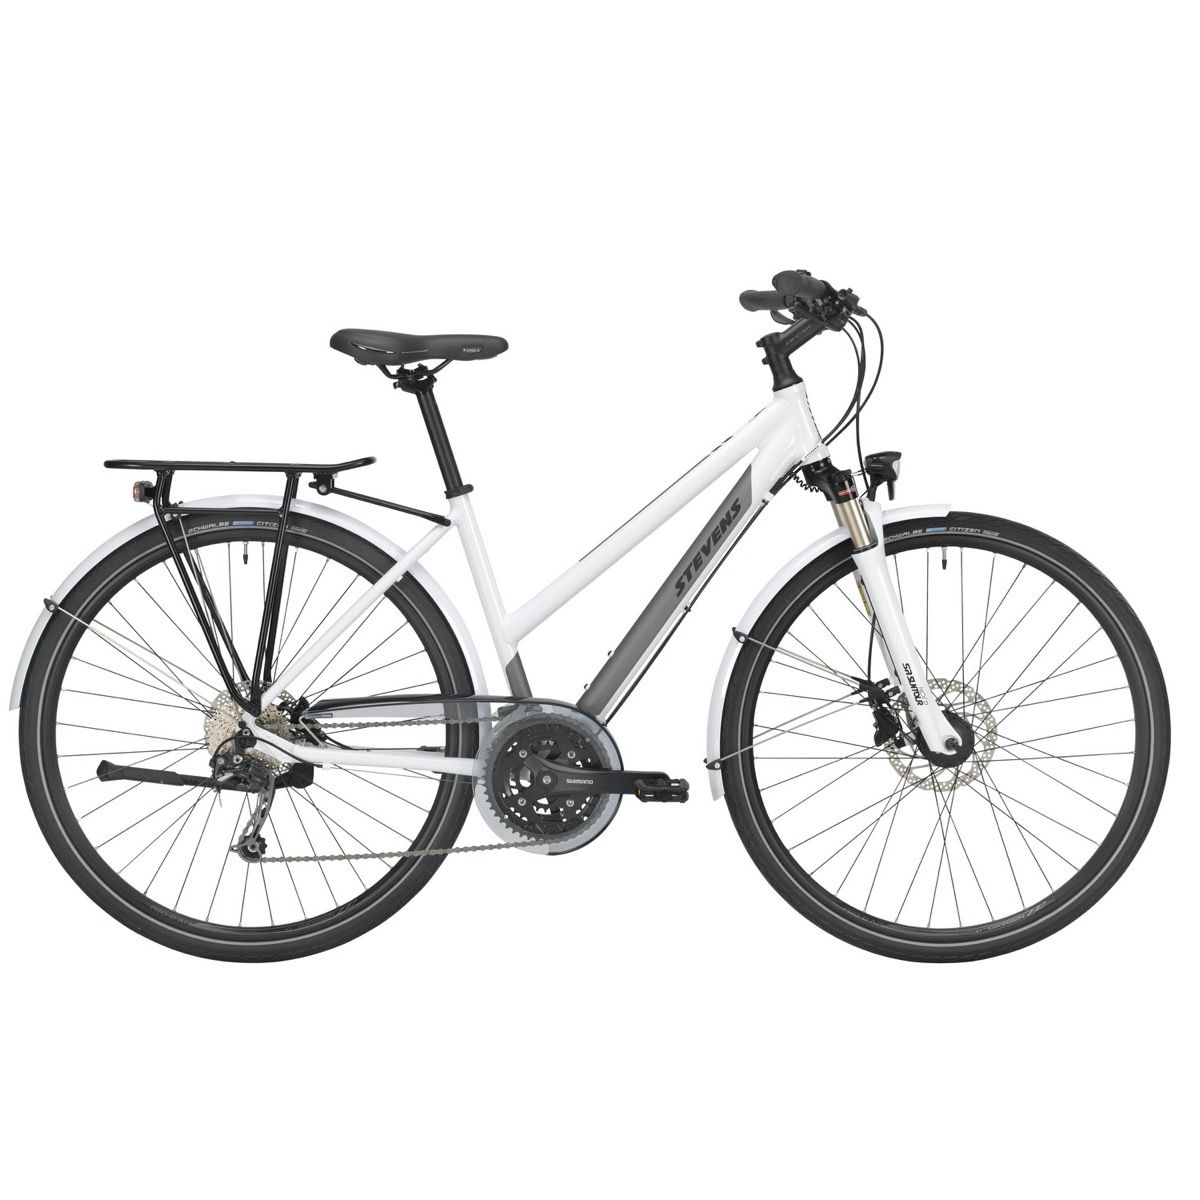 Fahrräder/Trekkingräder: STEVENS  Savoie Plus Lady 27 Gang Kettenschaltung Damenfahrrad Trapez Modell 2019 28 Zoll 54 cm